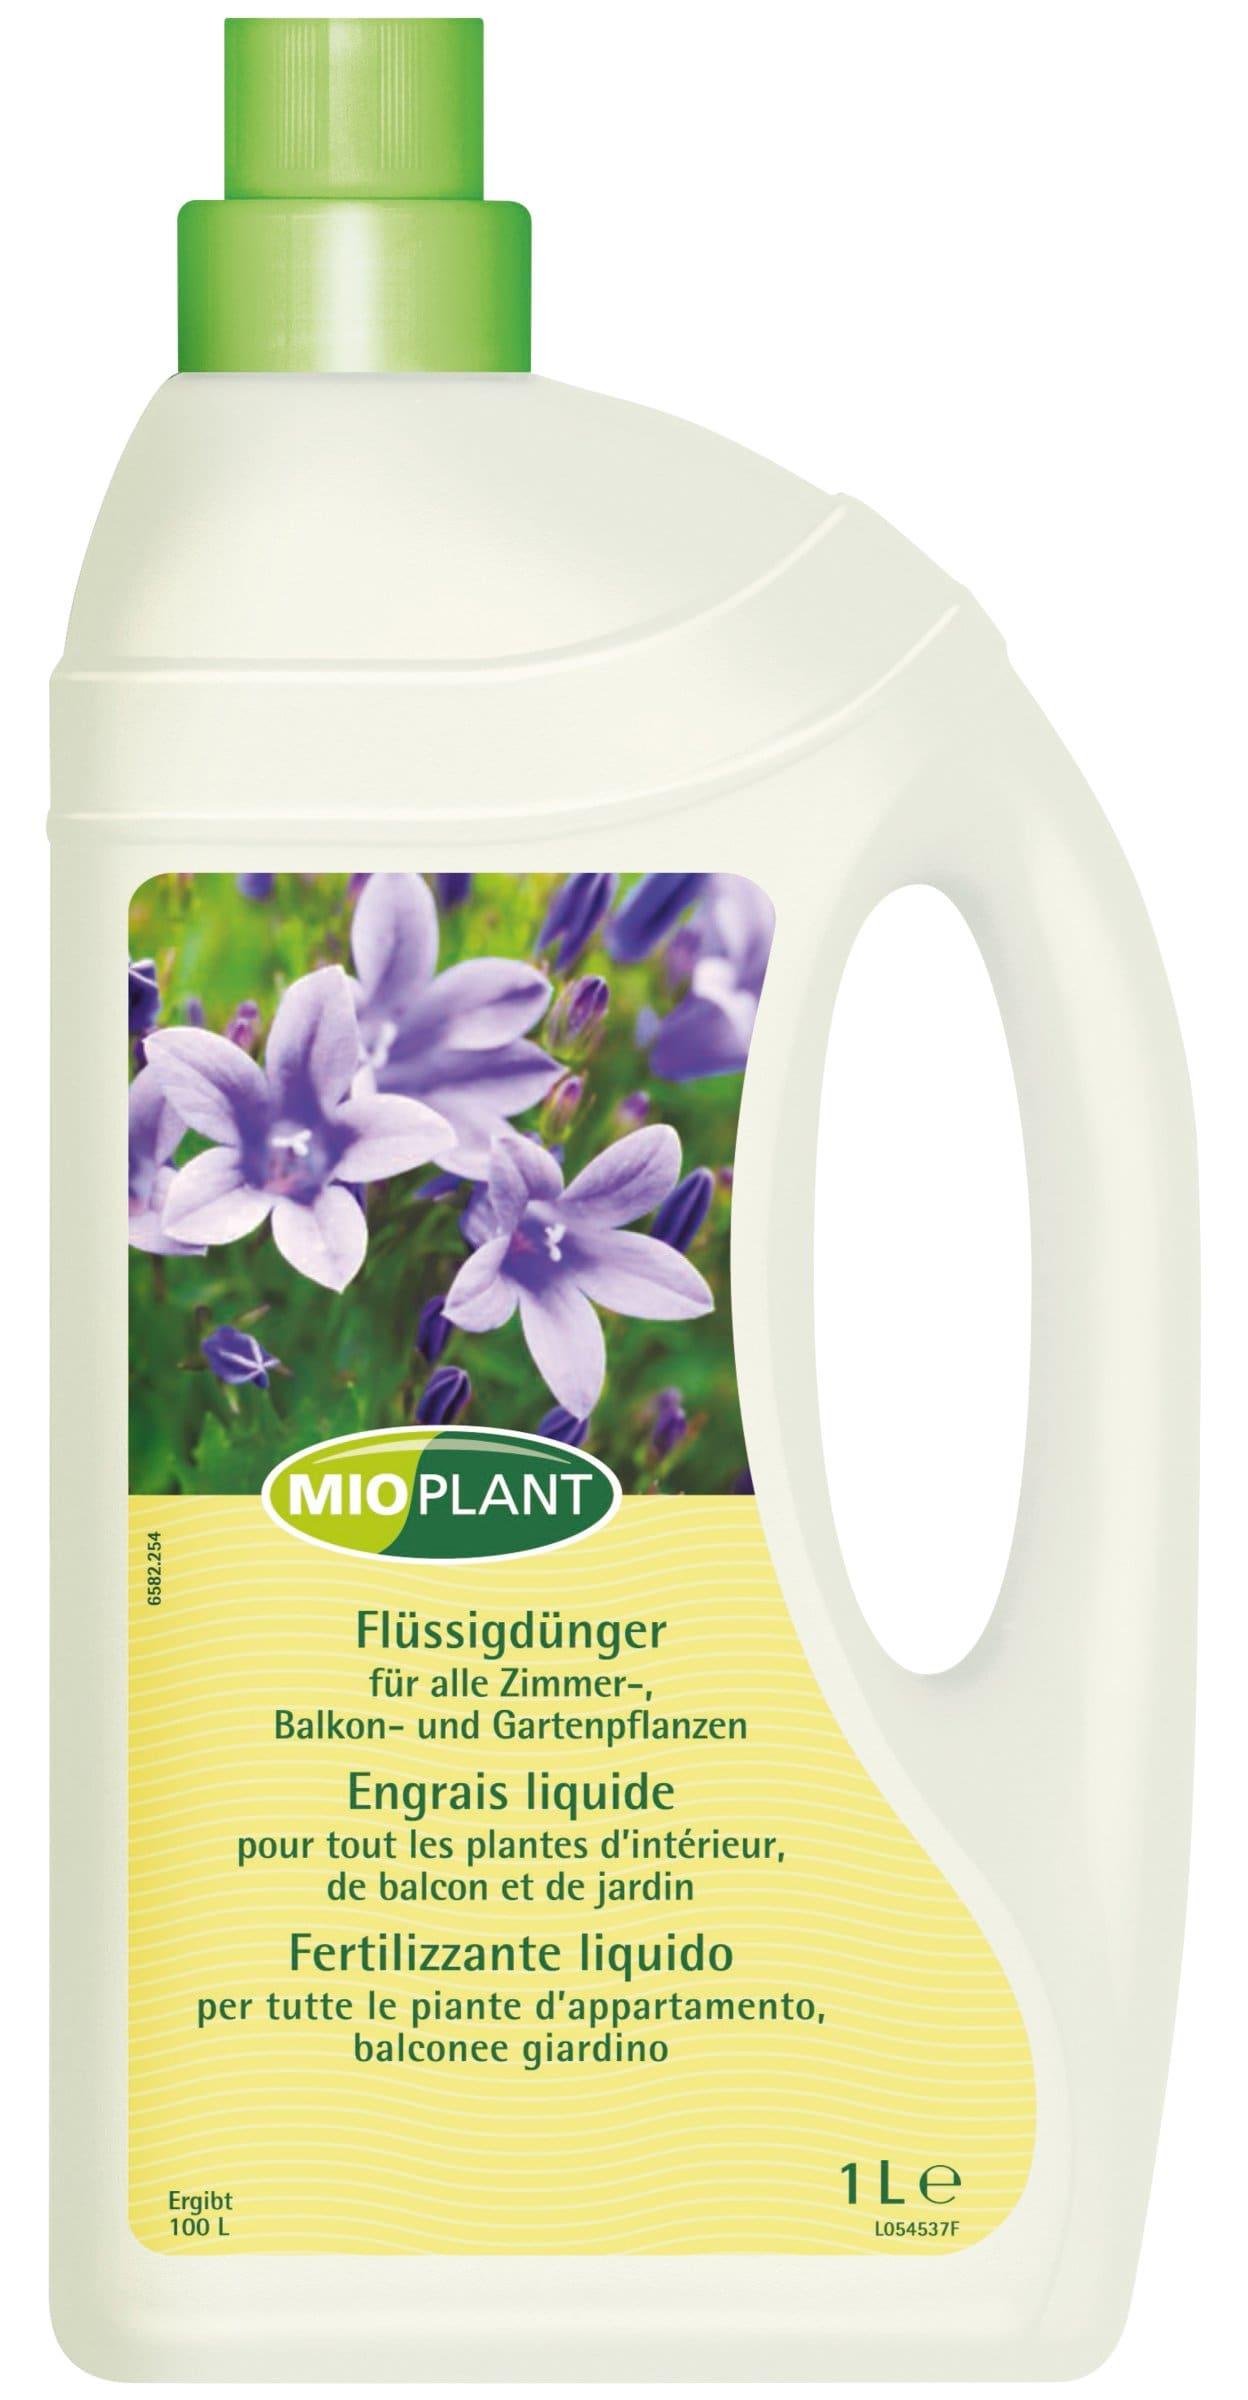 Mioplant Flüssigdünger, 1 l